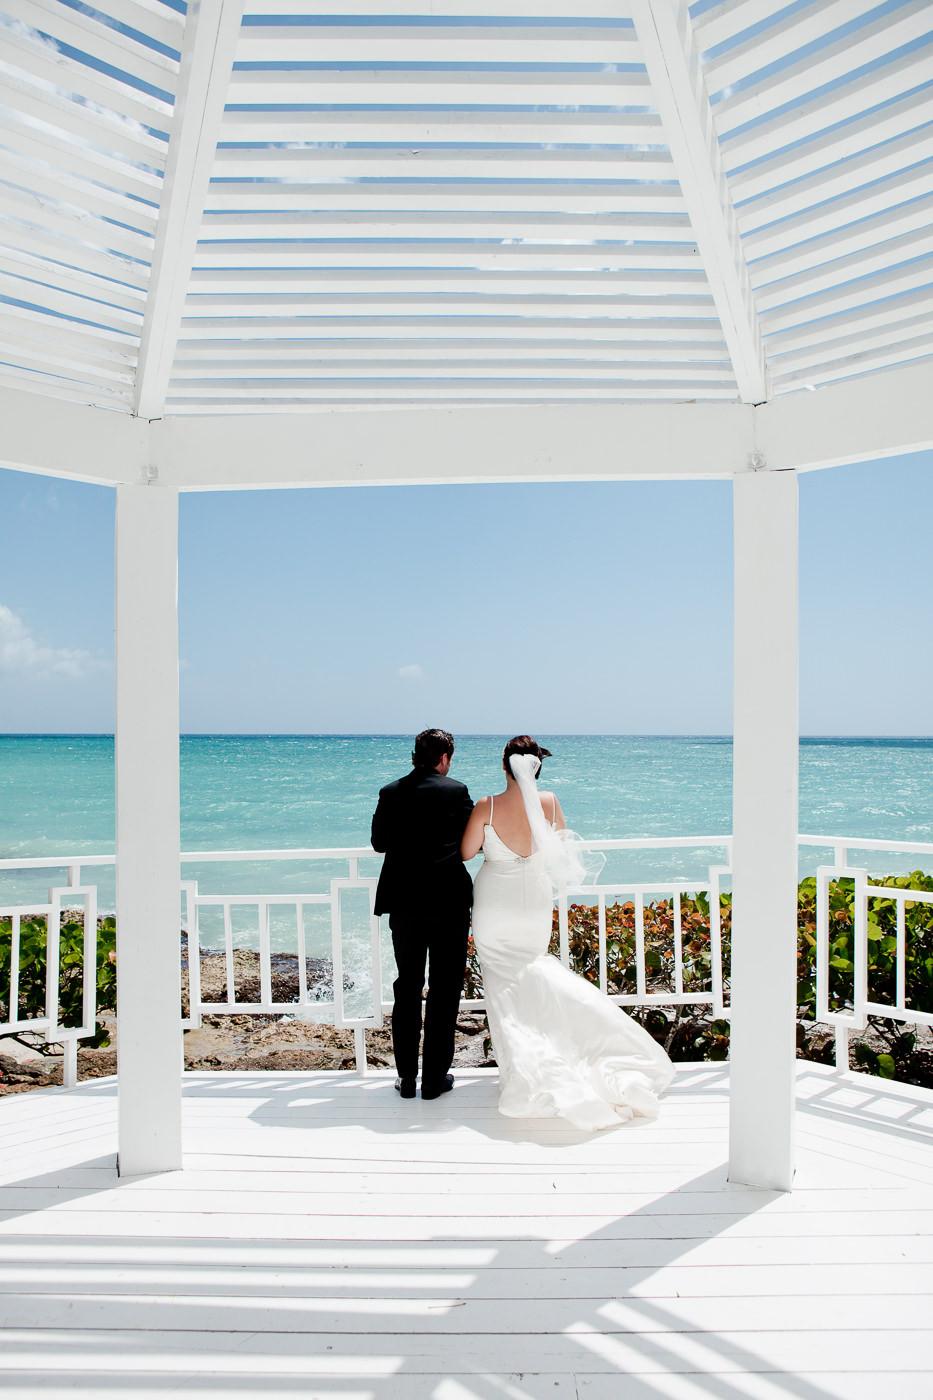 Toronto destination wedding photography